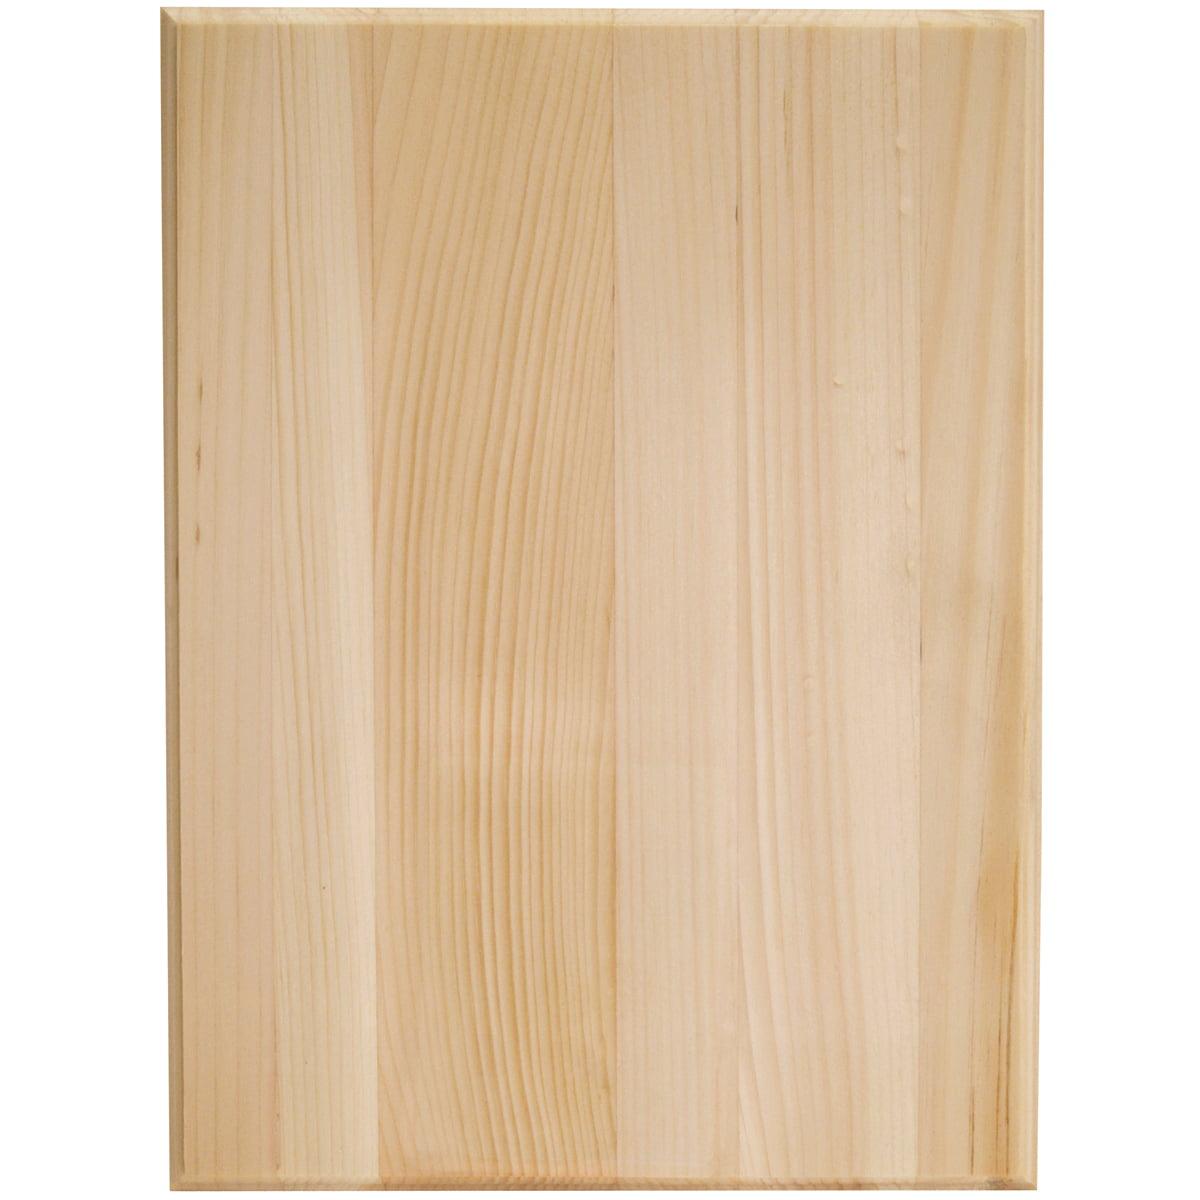 Walnut Hollow Rectangle Pine Plaque 9 x 12